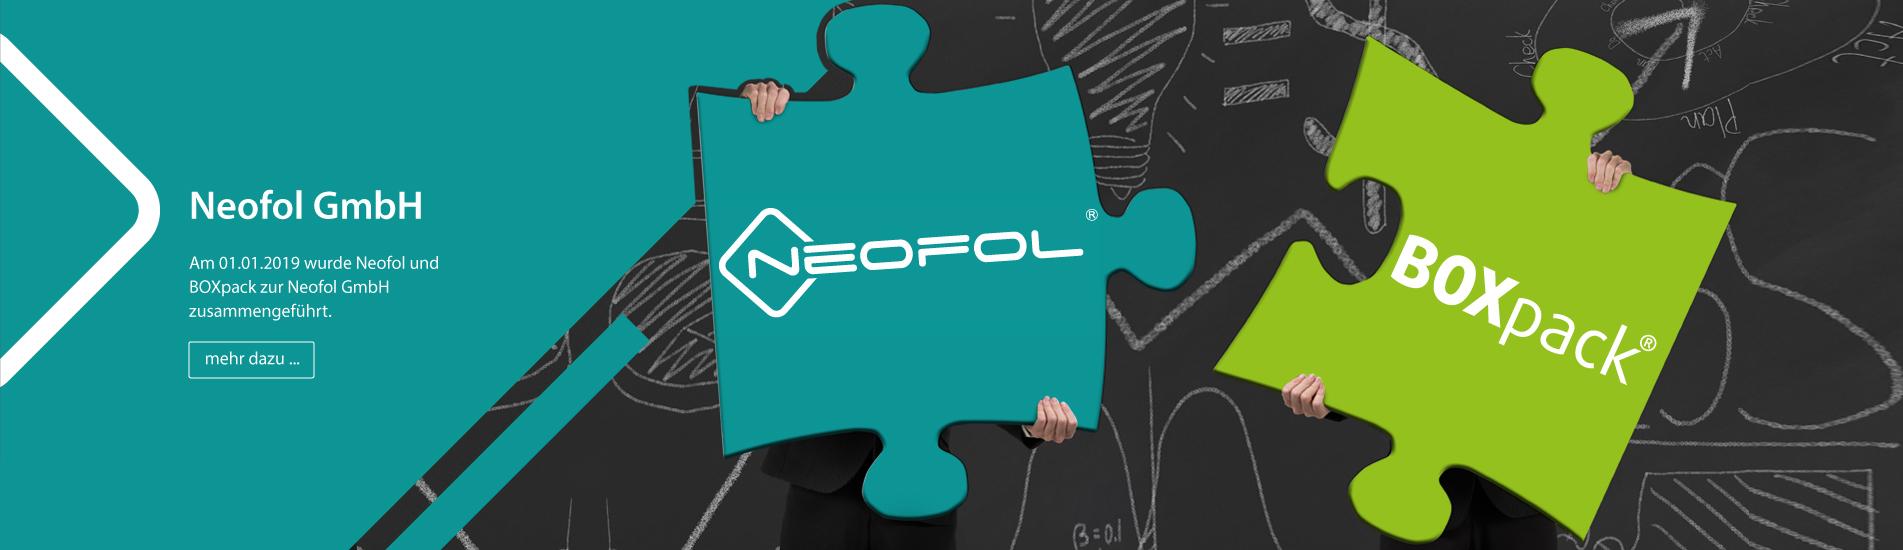 Neofol GmbH